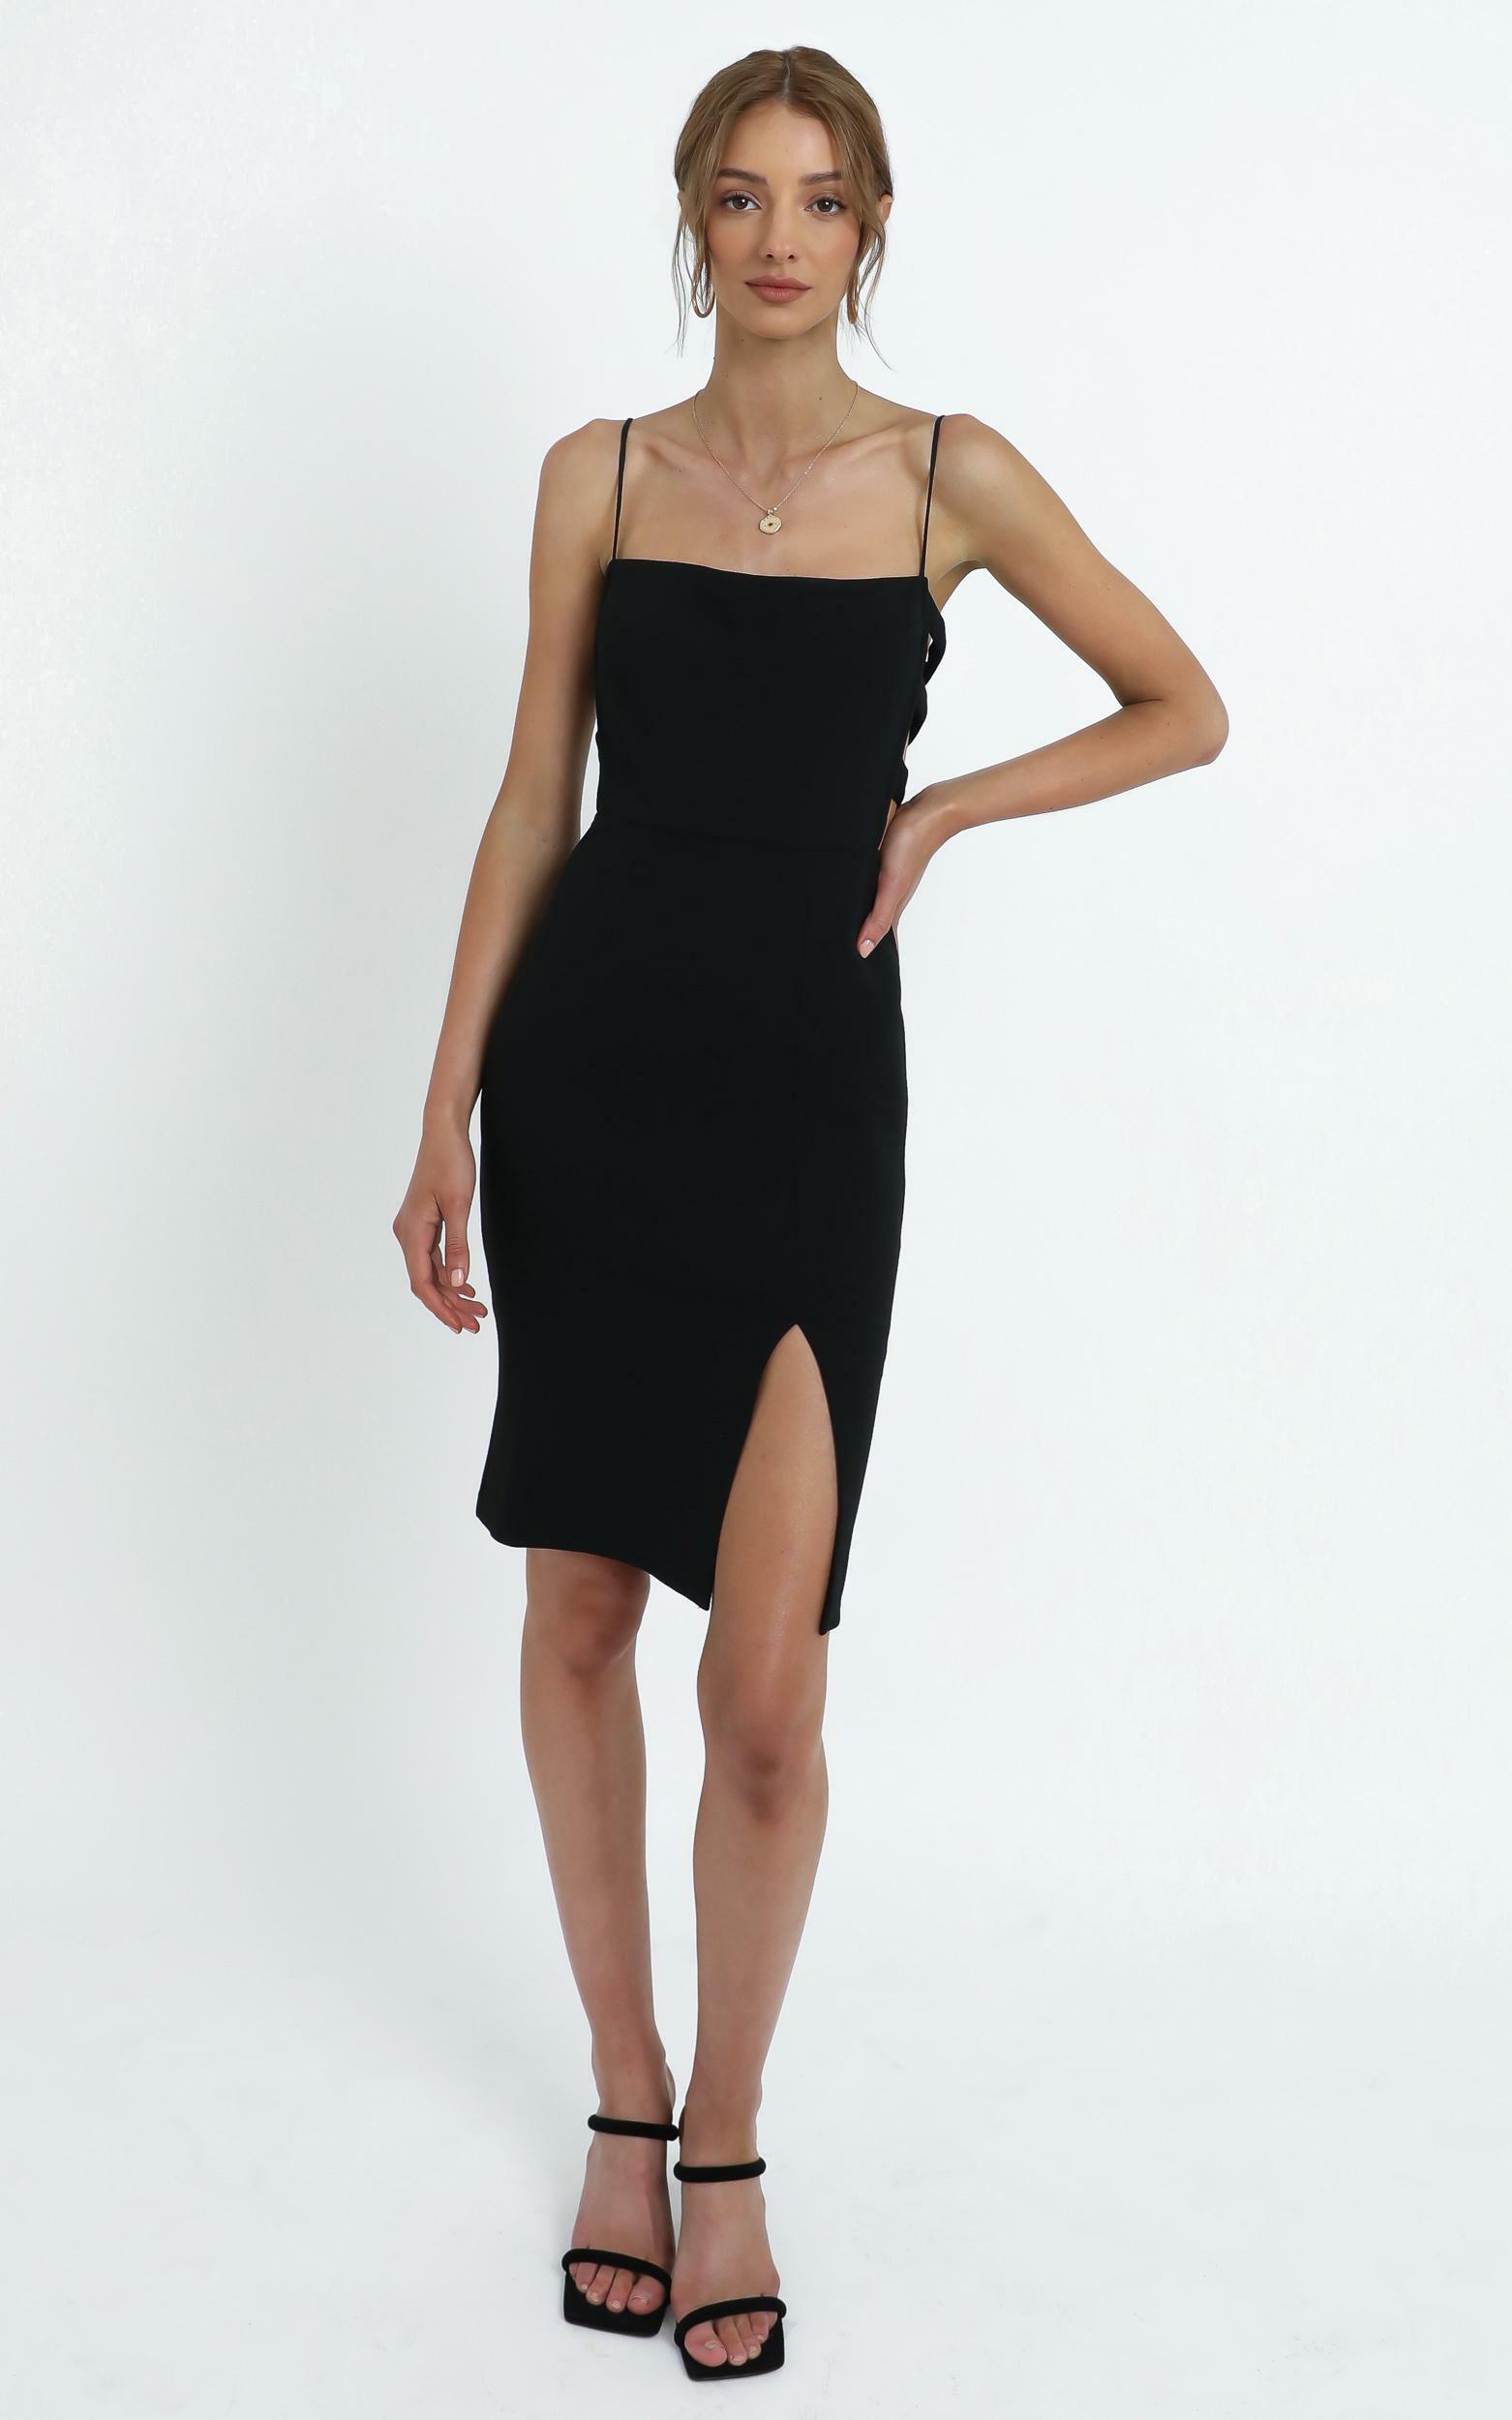 Leanne cut out midi dress in Black - 12 (L), Black, hi-res image number null